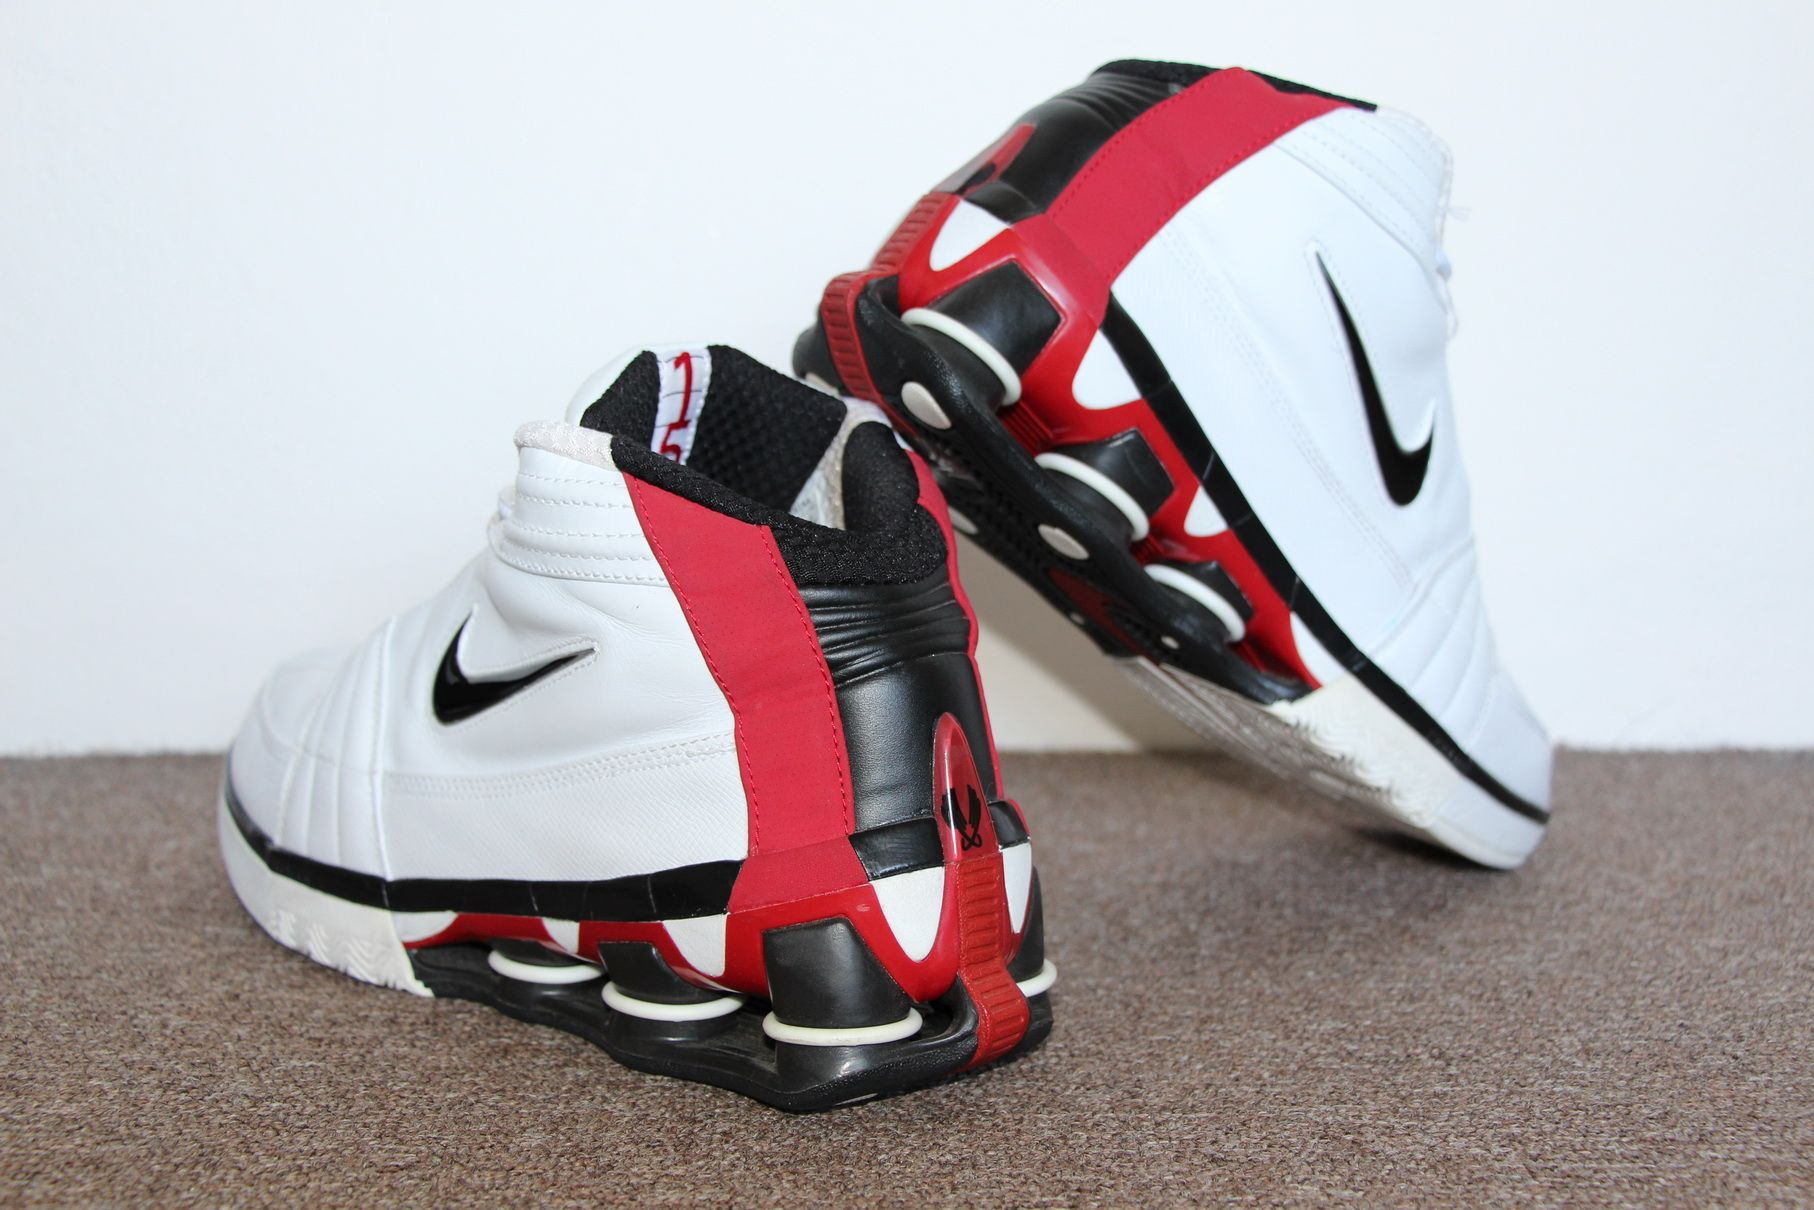 reputable site 46966 ece8d Nike Shox Vince Carter IV 2004 (White Black – Varsity Red)